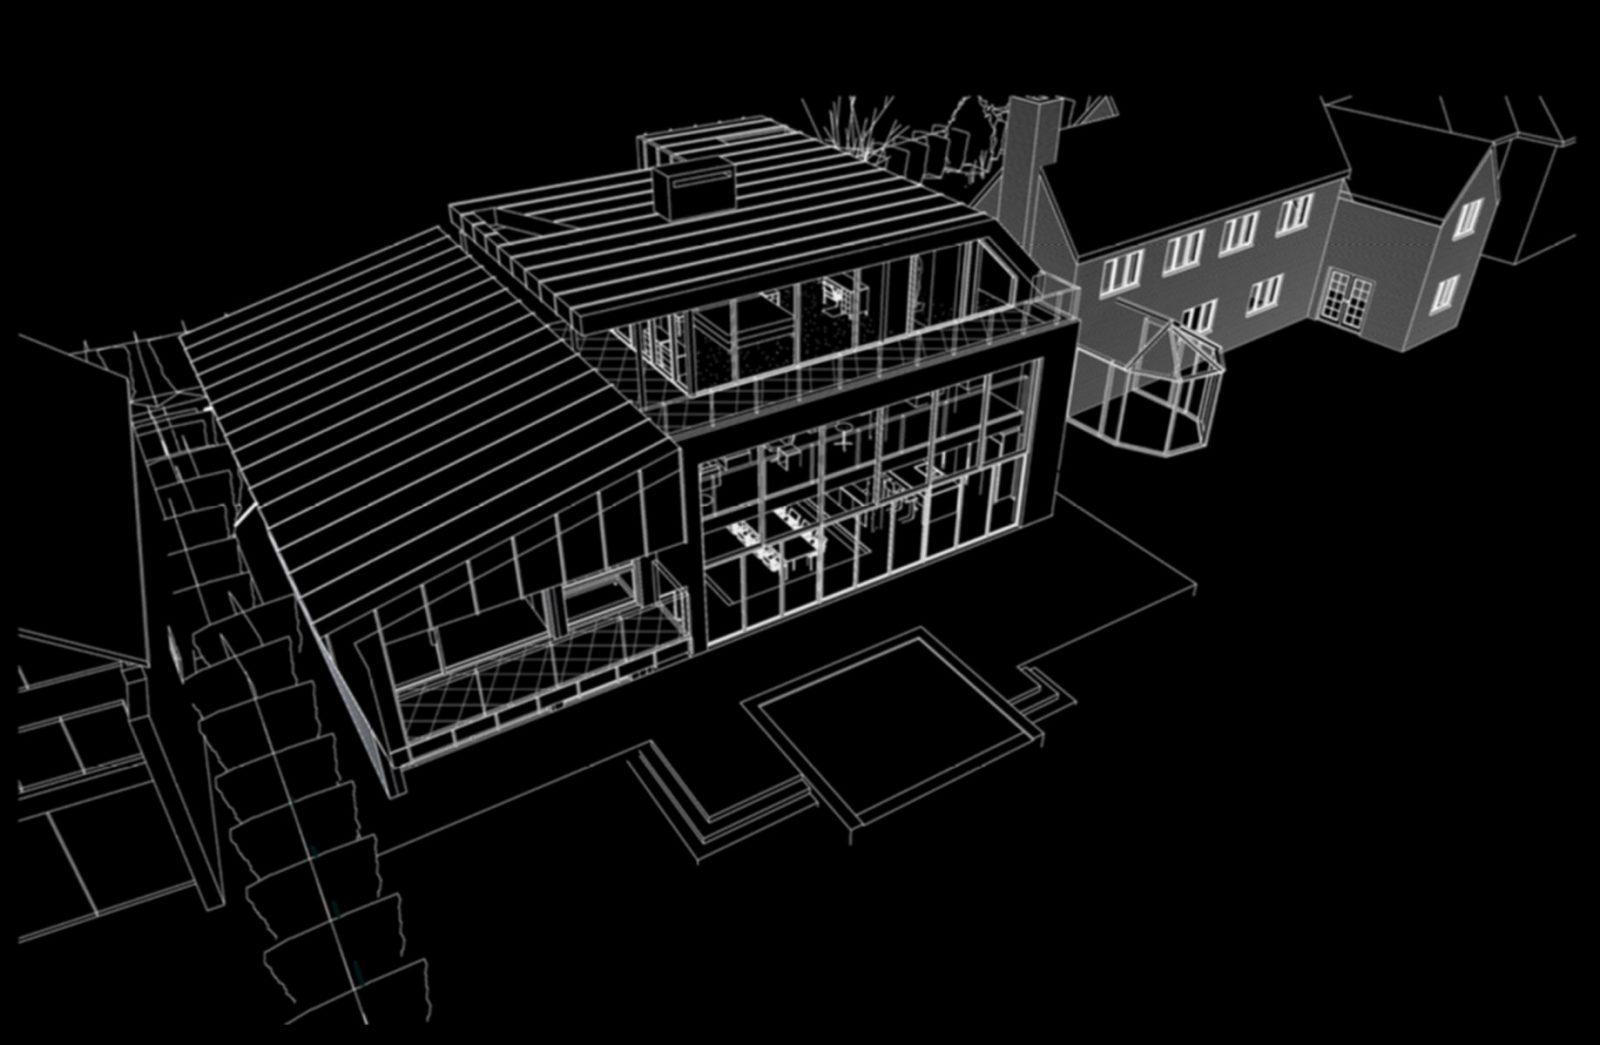 weathervane house modern architecture saundersfoot pembrokeshire architects jersey4